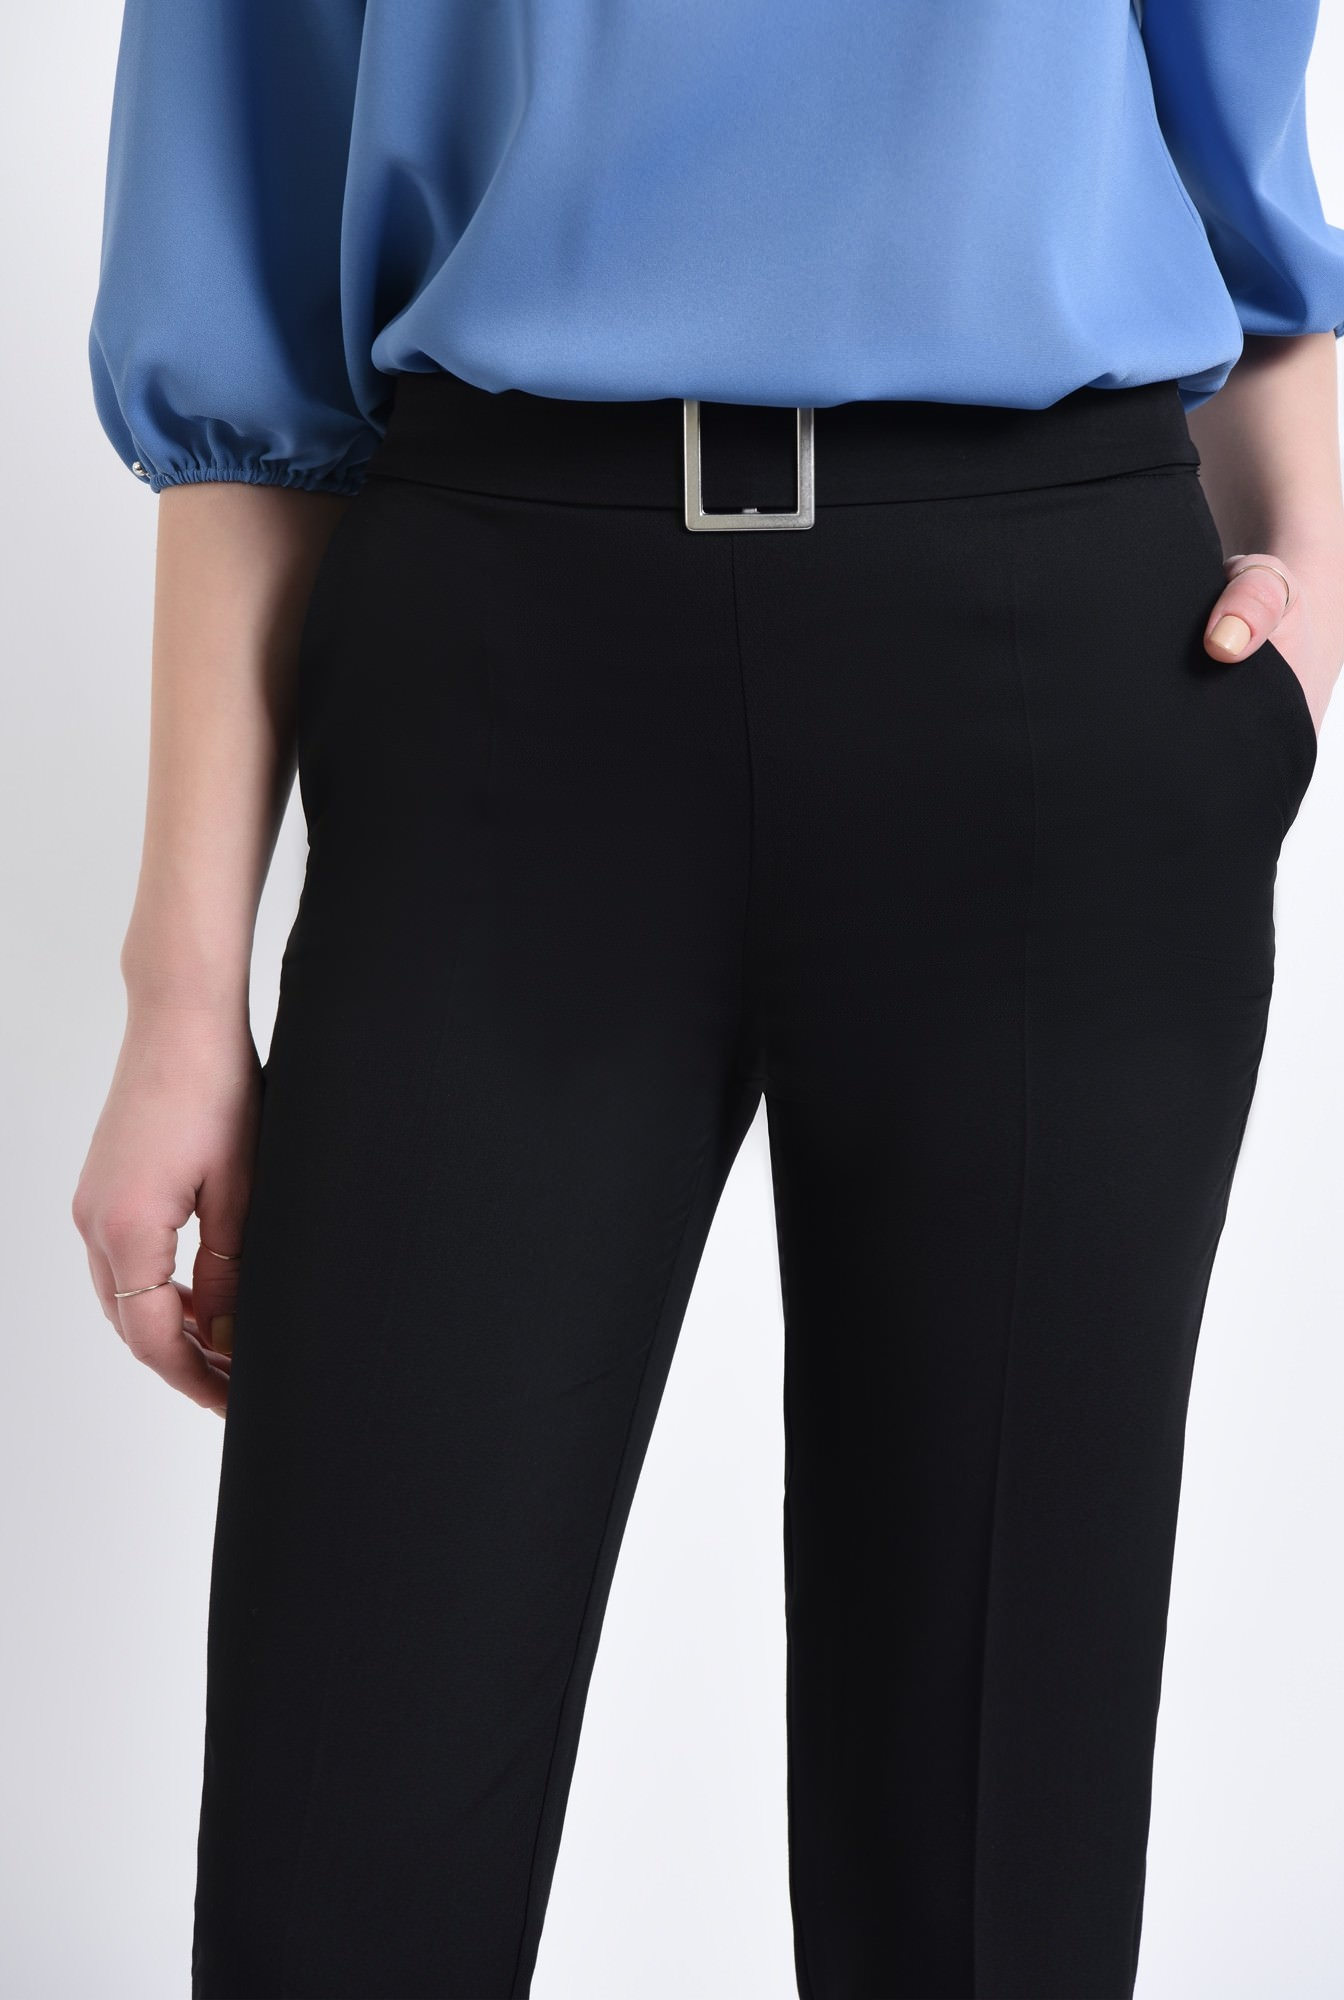 2 - 360 - Pantaloni la dunga, cu mansete, betelie